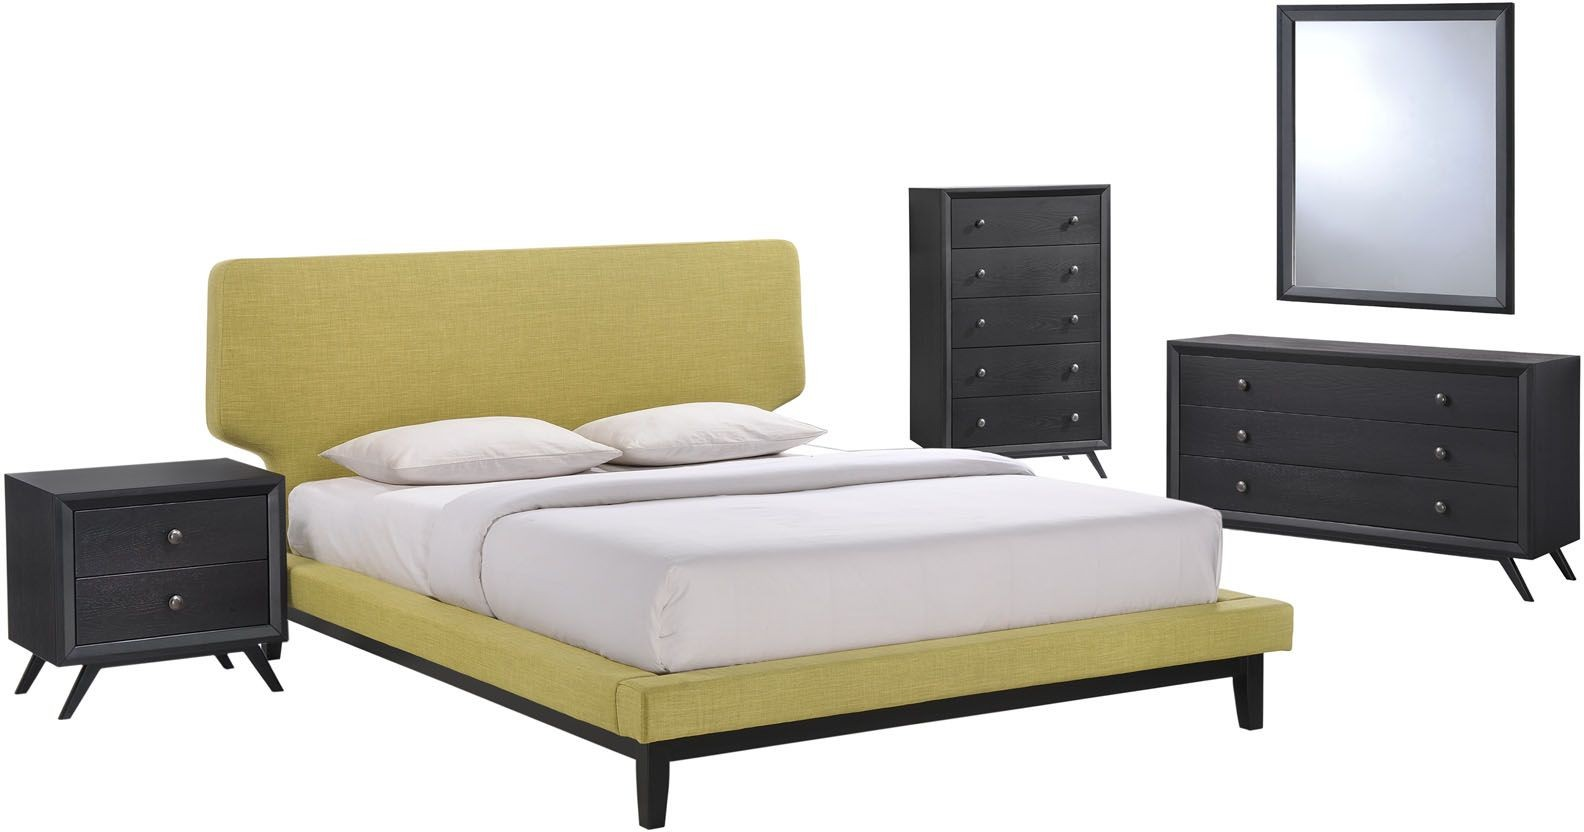 bethany black green 5 piece queen platform bedroom set eei mod 5335 blk grn set renegade furniture. Black Bedroom Furniture Sets. Home Design Ideas